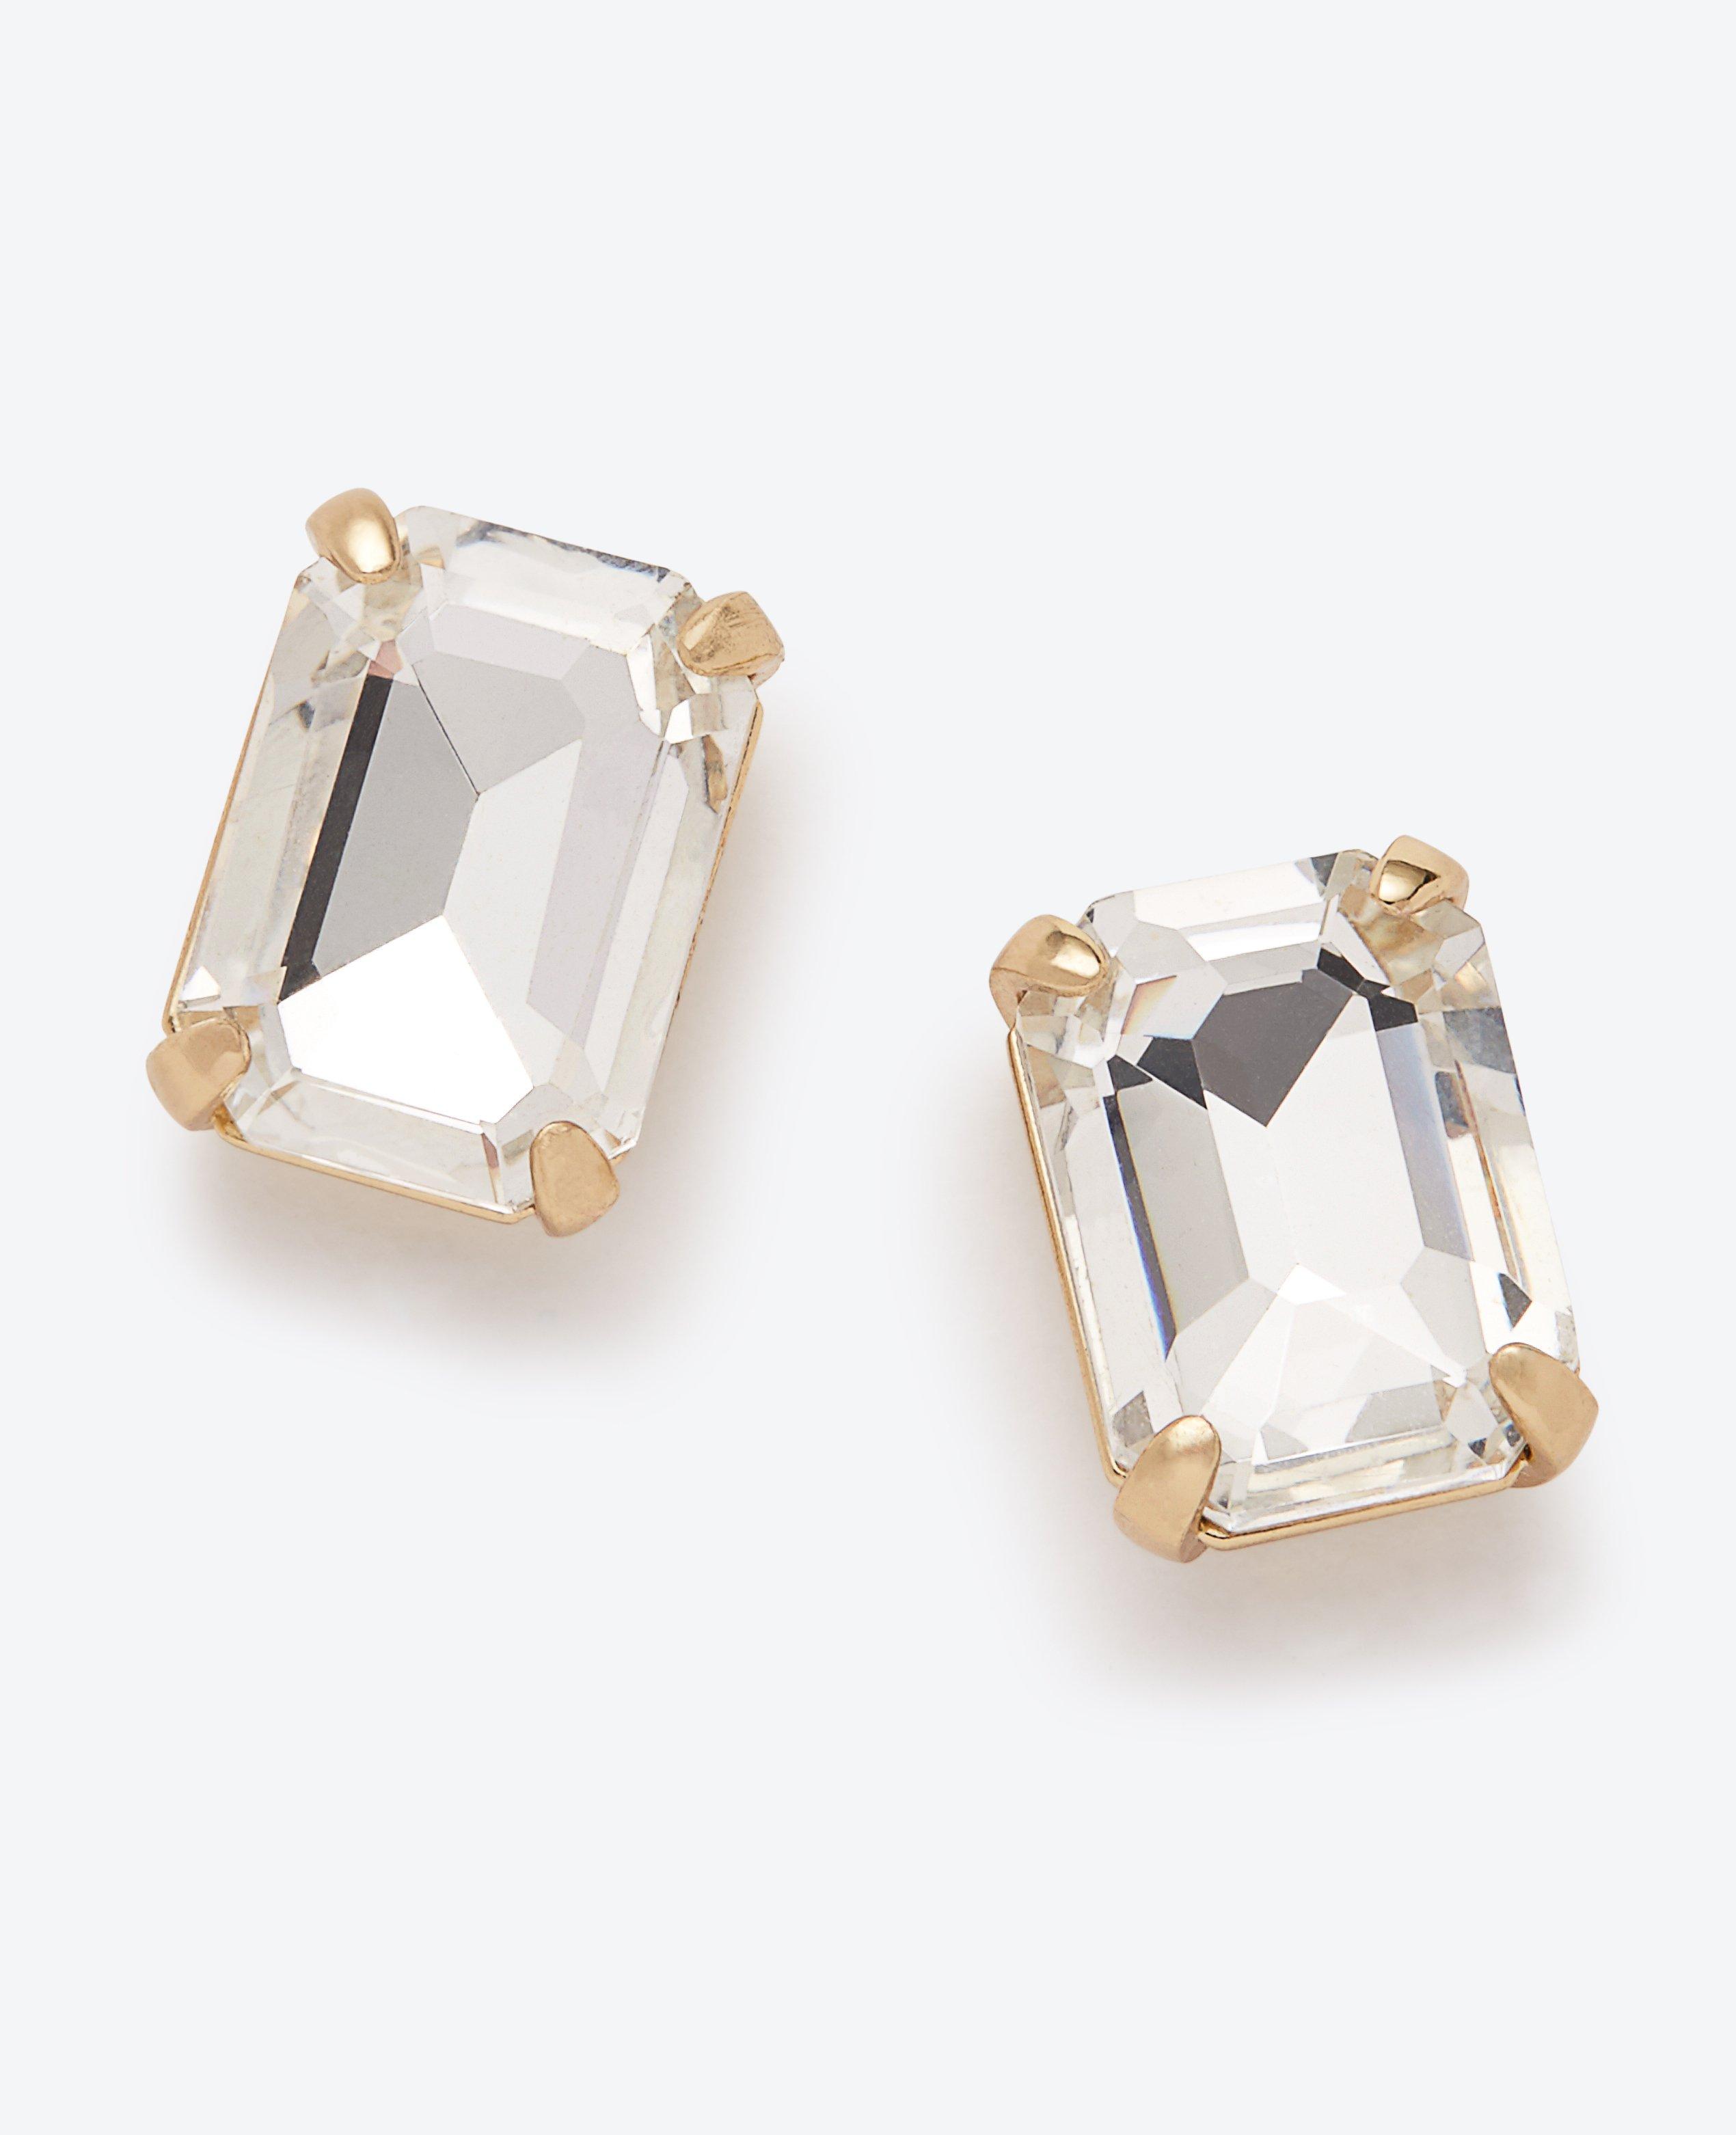 fc62ccd9a Ann Taylor Crystal Rectangle Stud Earrings in Metallic - Lyst